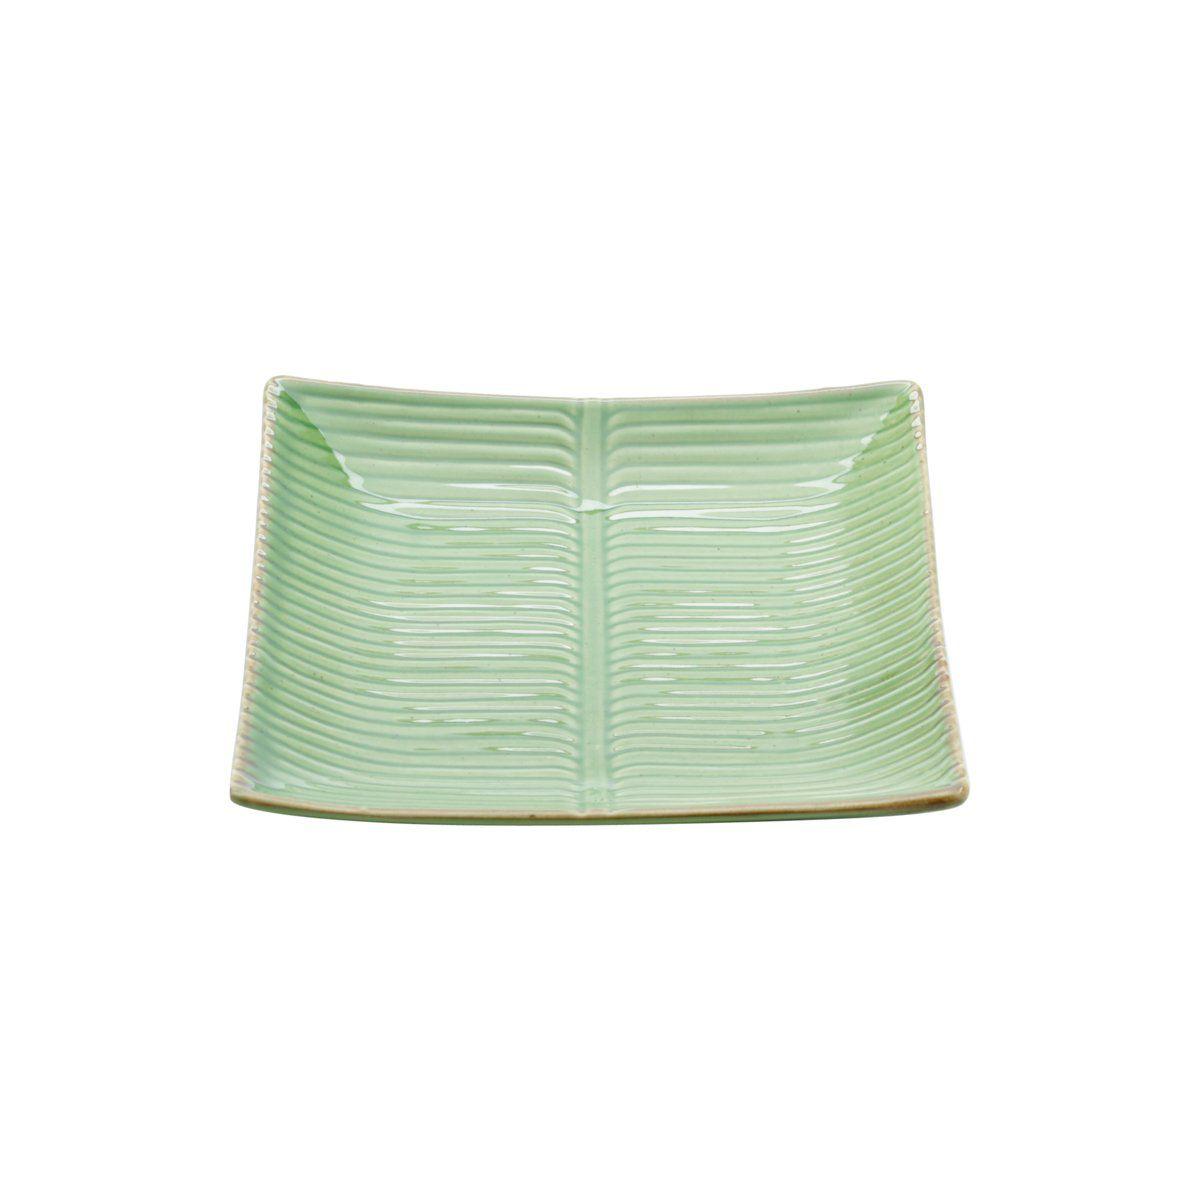 Prato decorativo 21,5 x 21,5 cm de cerâmica verde Banana Leaf Lyor - L4129